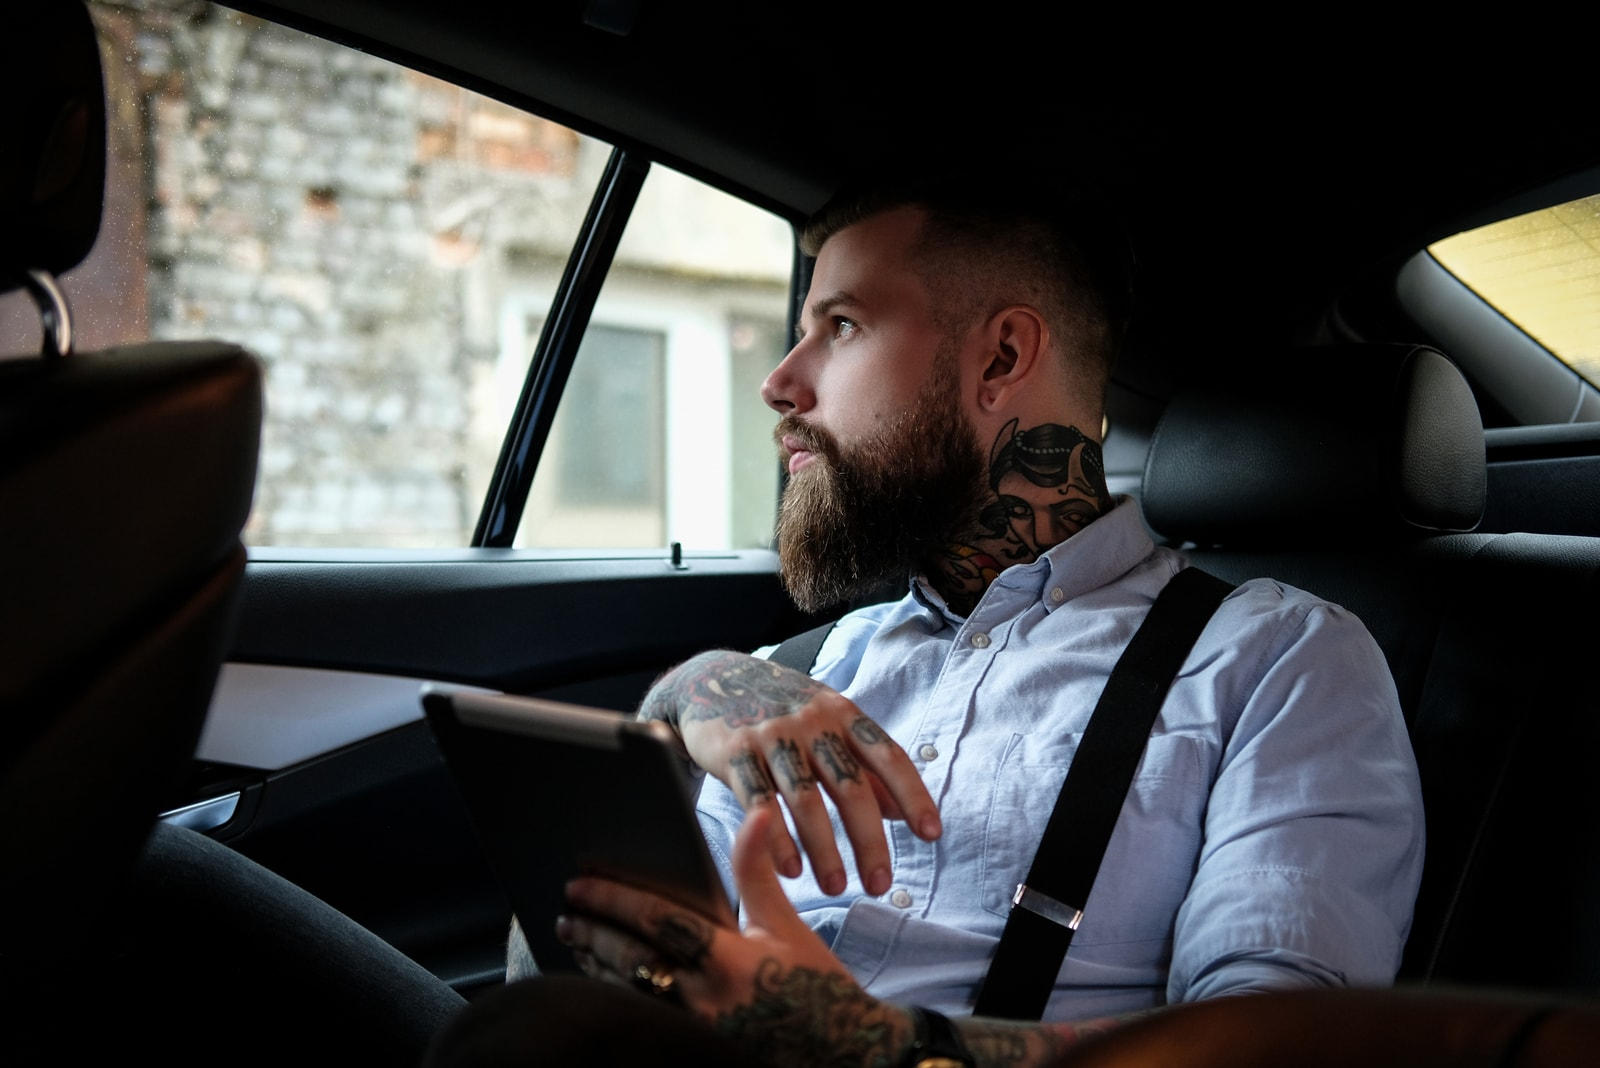 tattooed man sitting in the car